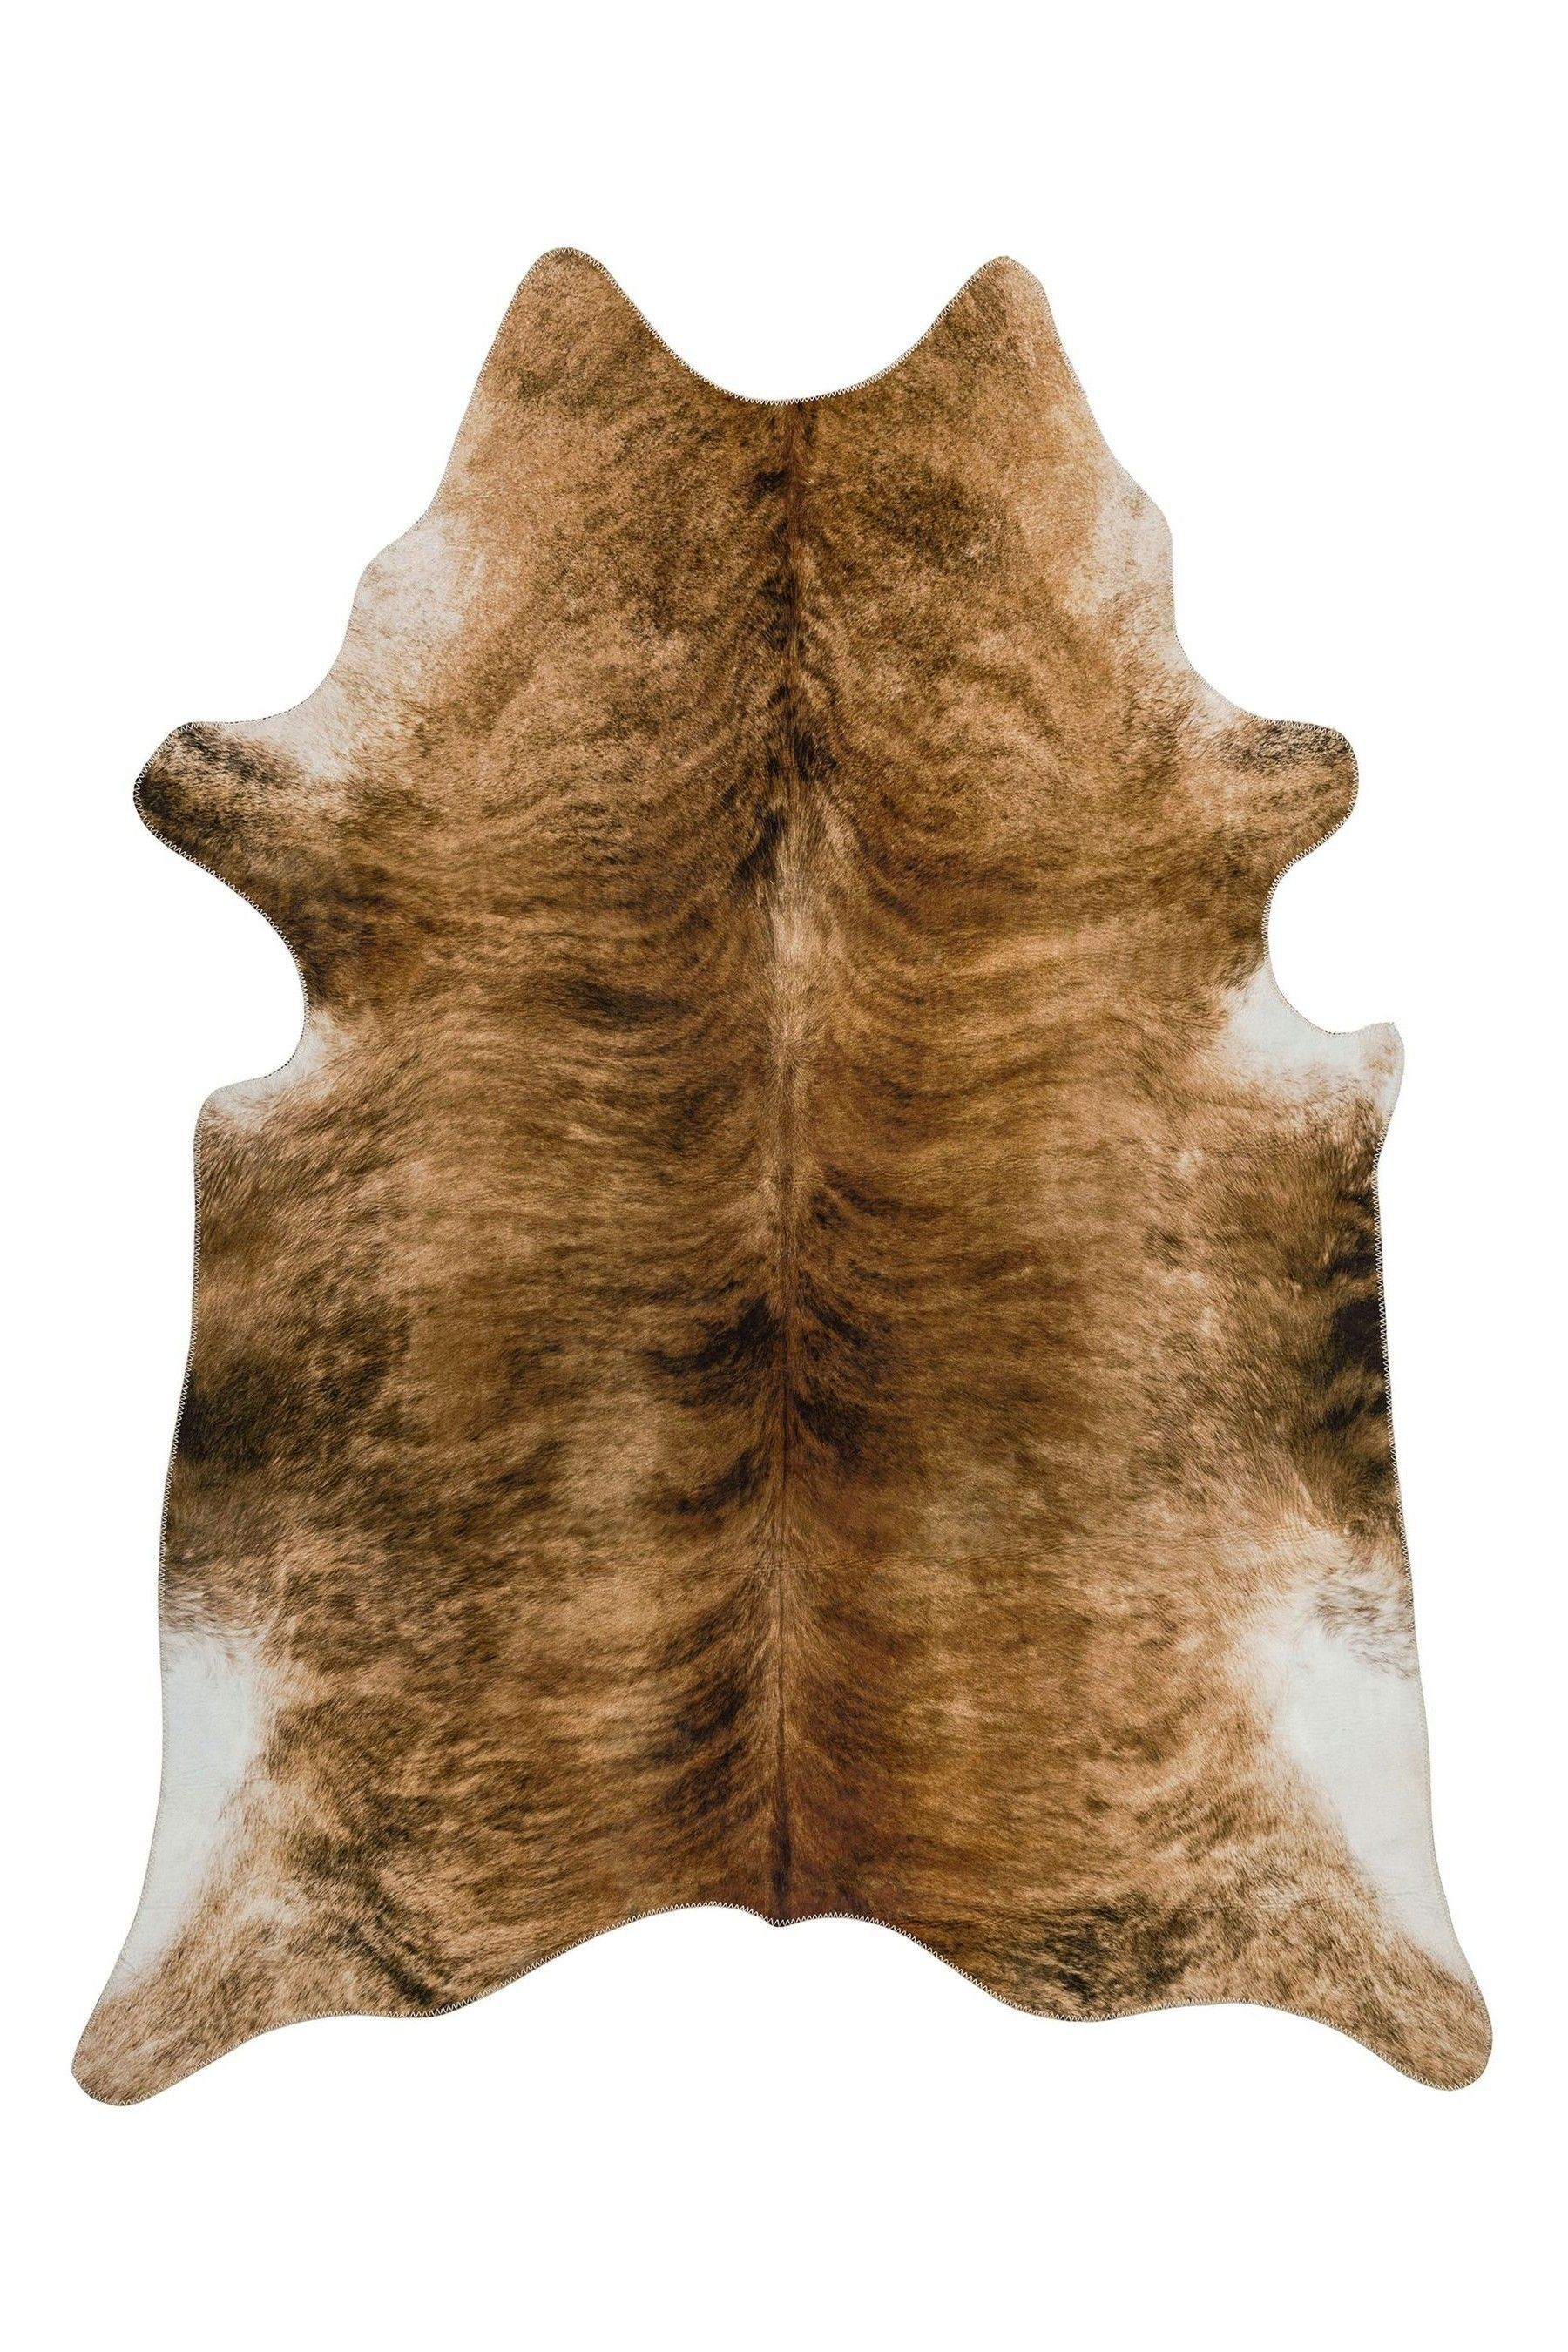 Texas Faux Cowhide Rug By Asiatic Rugs